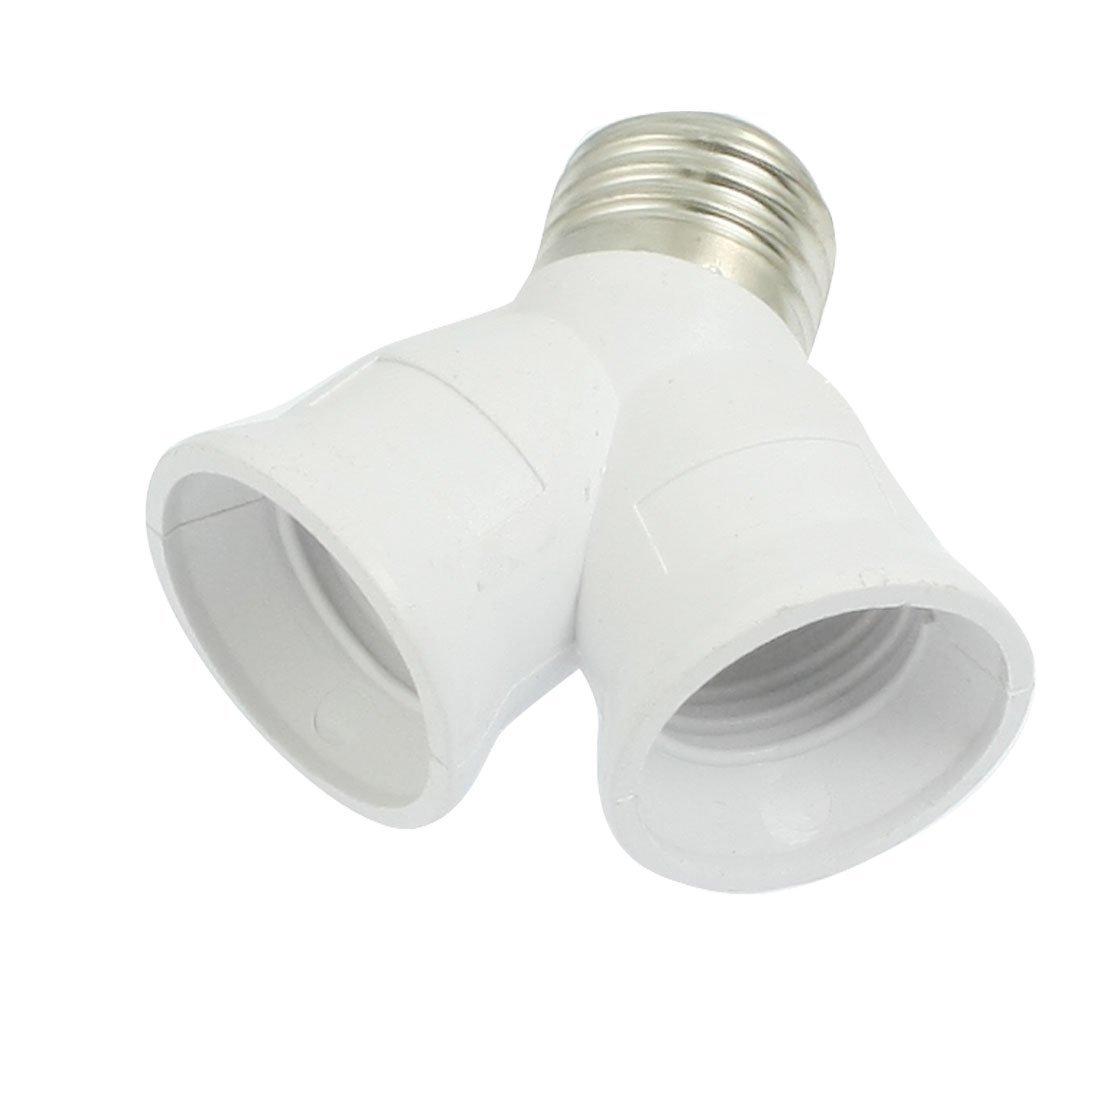 Cheap Conversores de suporte da lâmpada